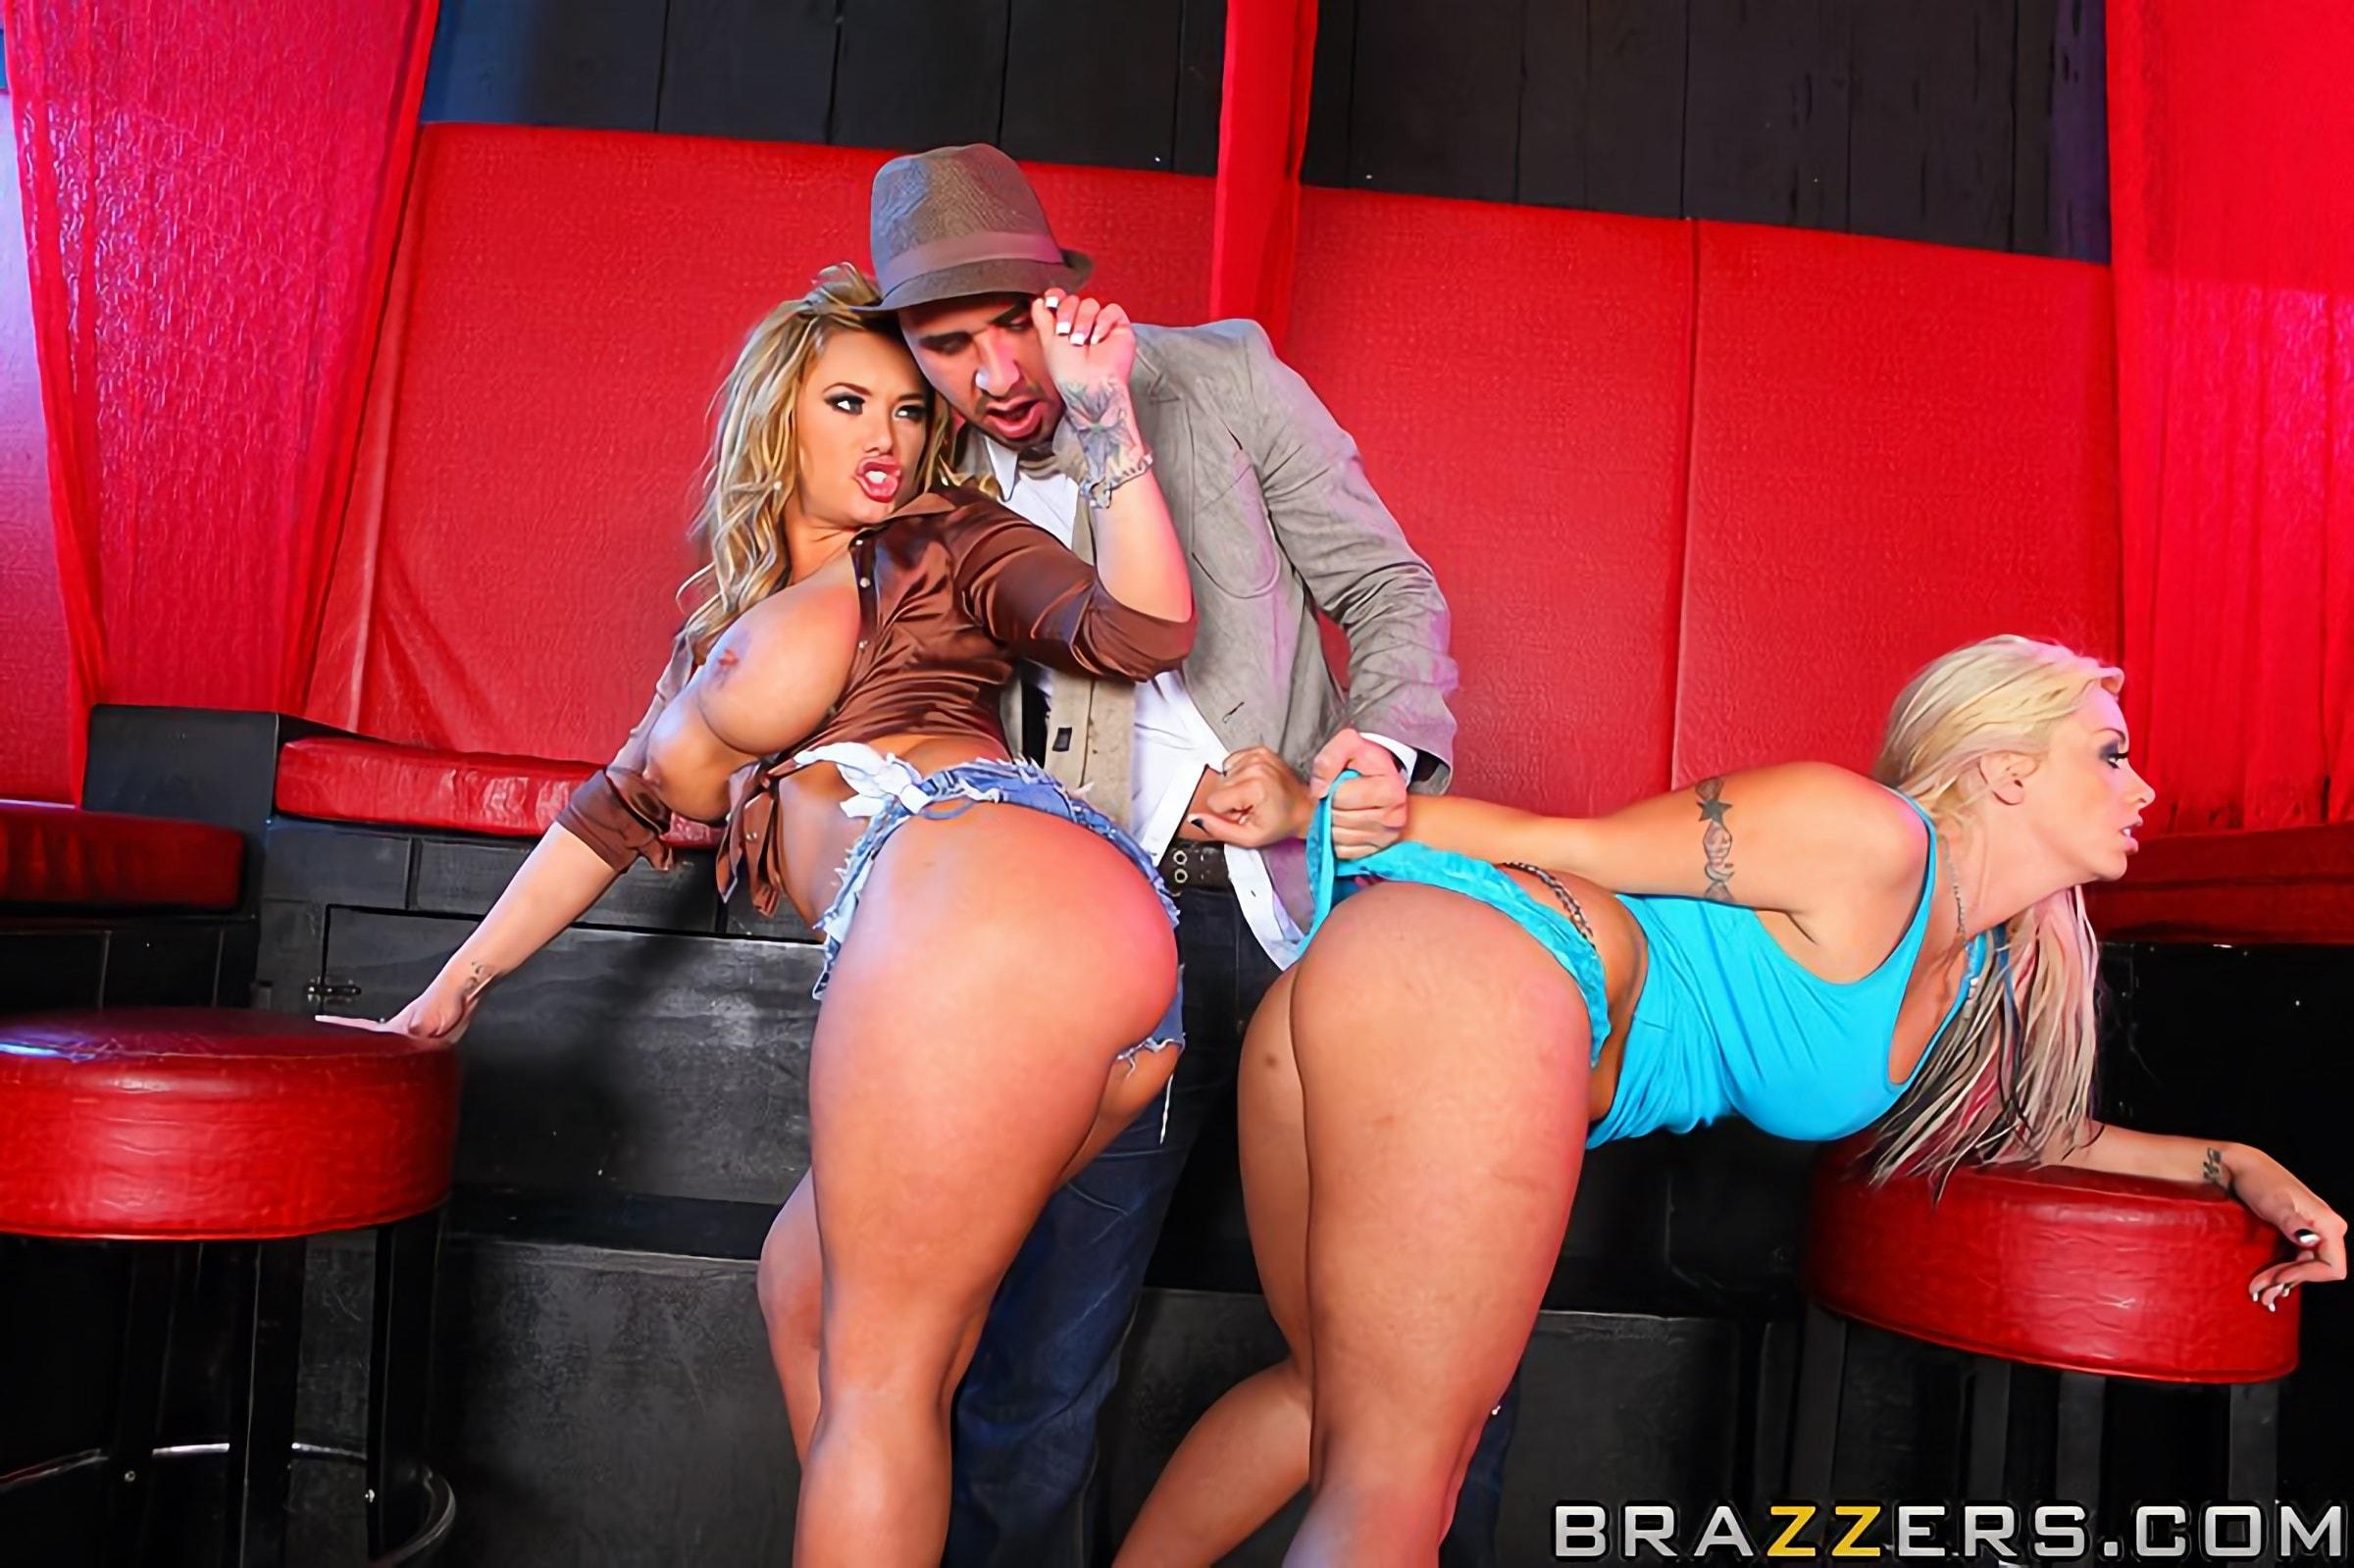 Brazzers 'Free Ass Ride' starring Brittney Skye (Photo 6)